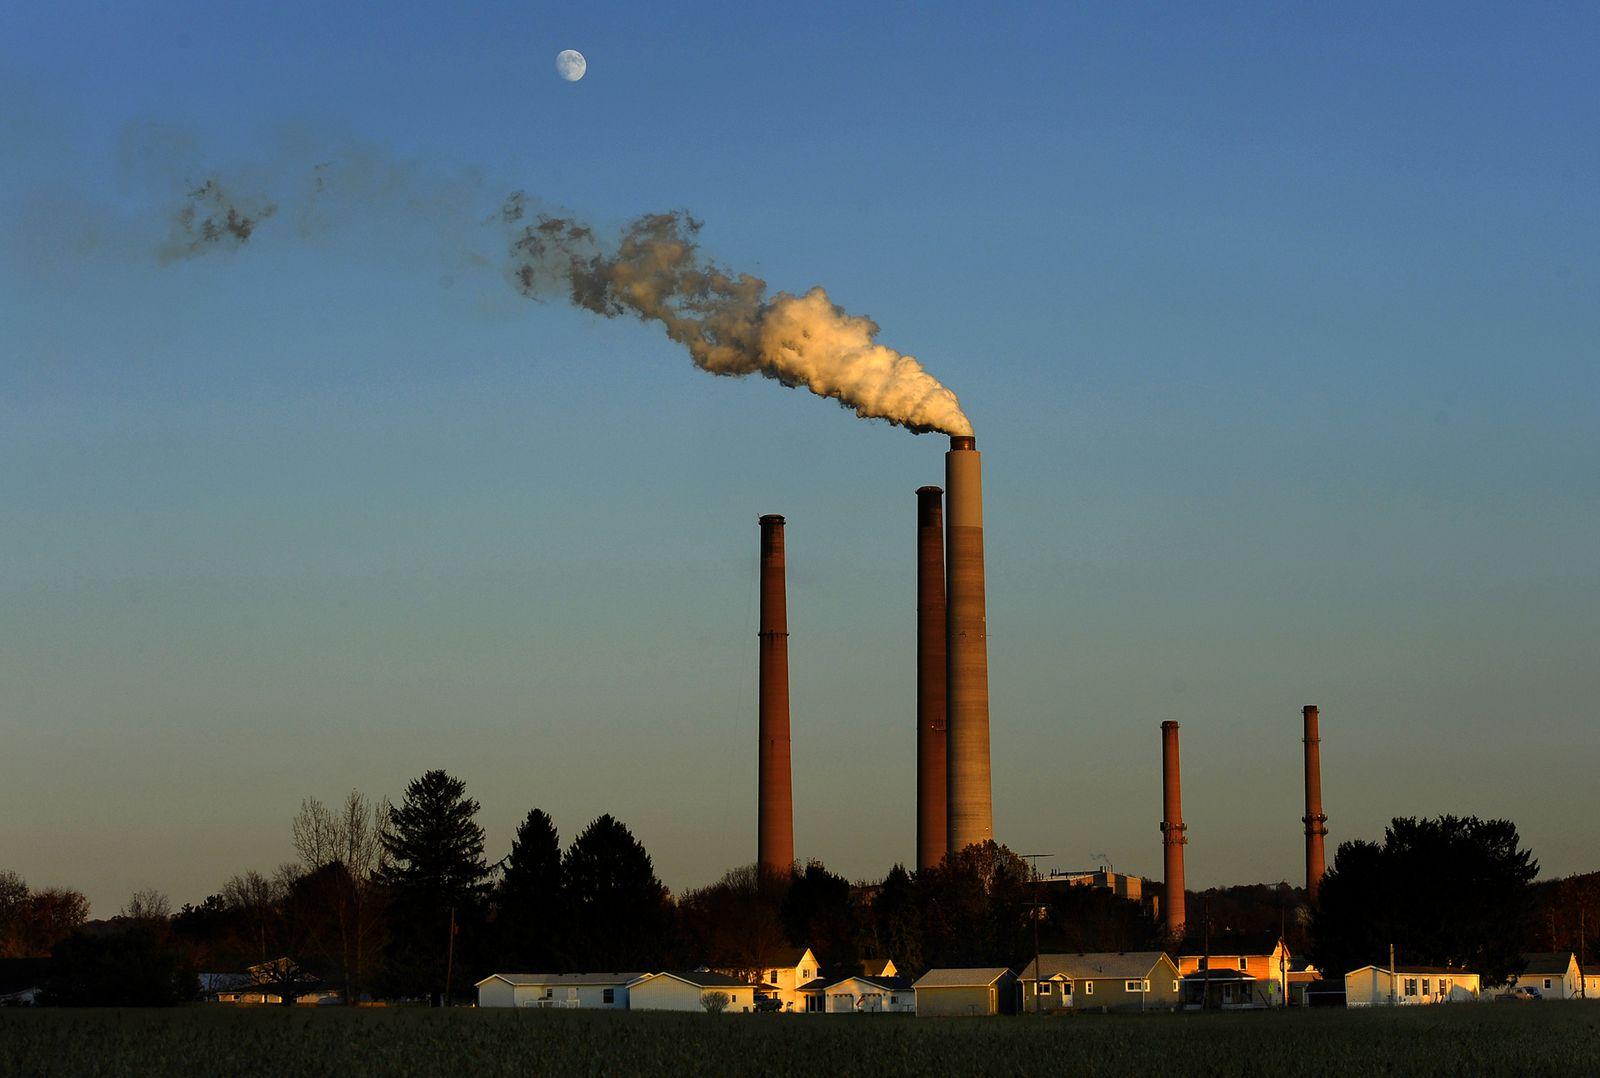 The A.E.P. (American Electric Power) coal burning plant in Conesville, Ohio.